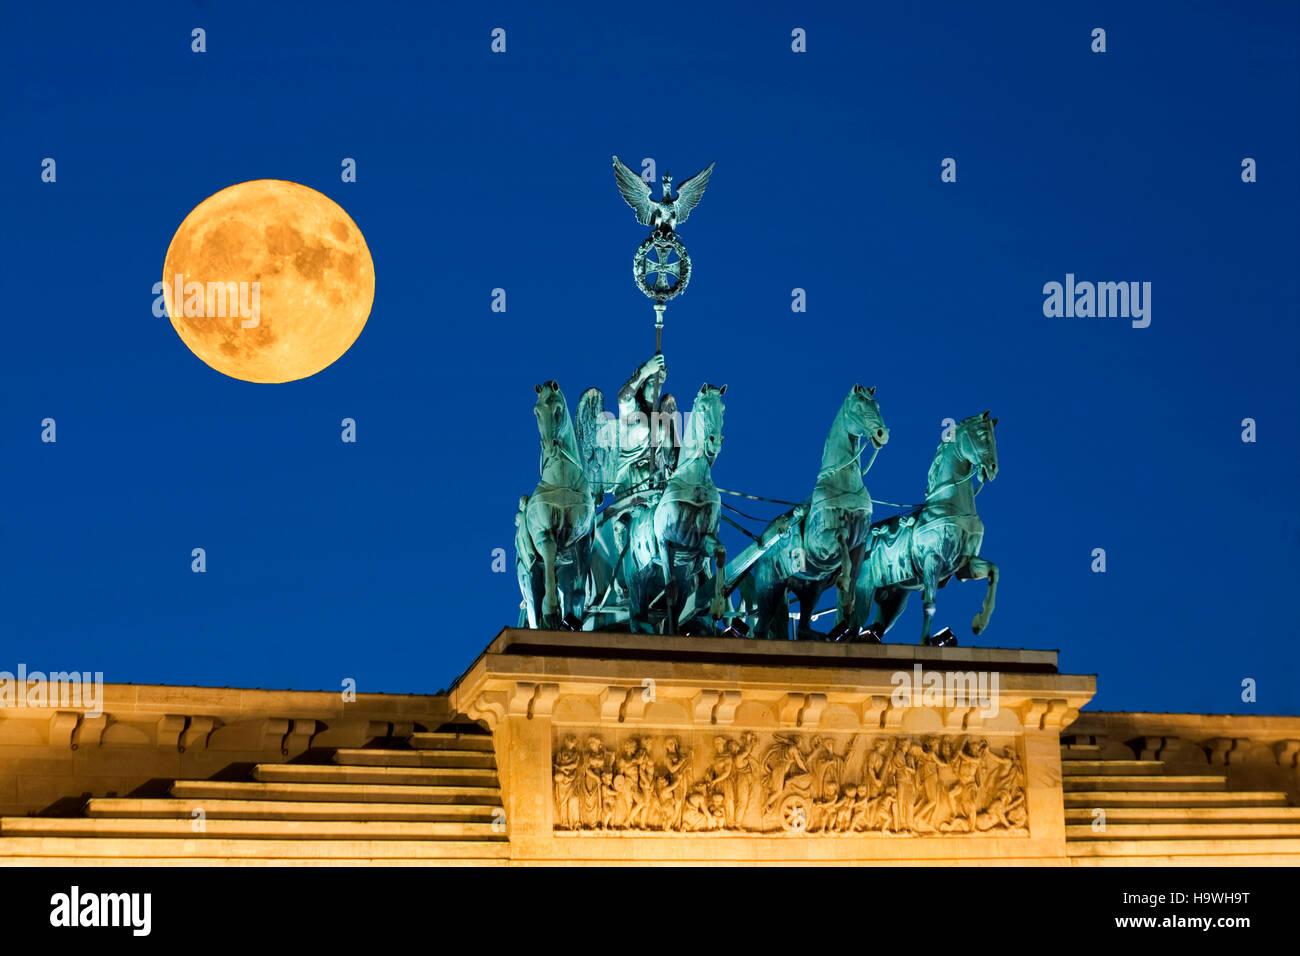 Full moon, Super moon, Supermoon, Vollmond, Supermond, Berlin brandenburg gate , paris square, quadriga - Stock Image